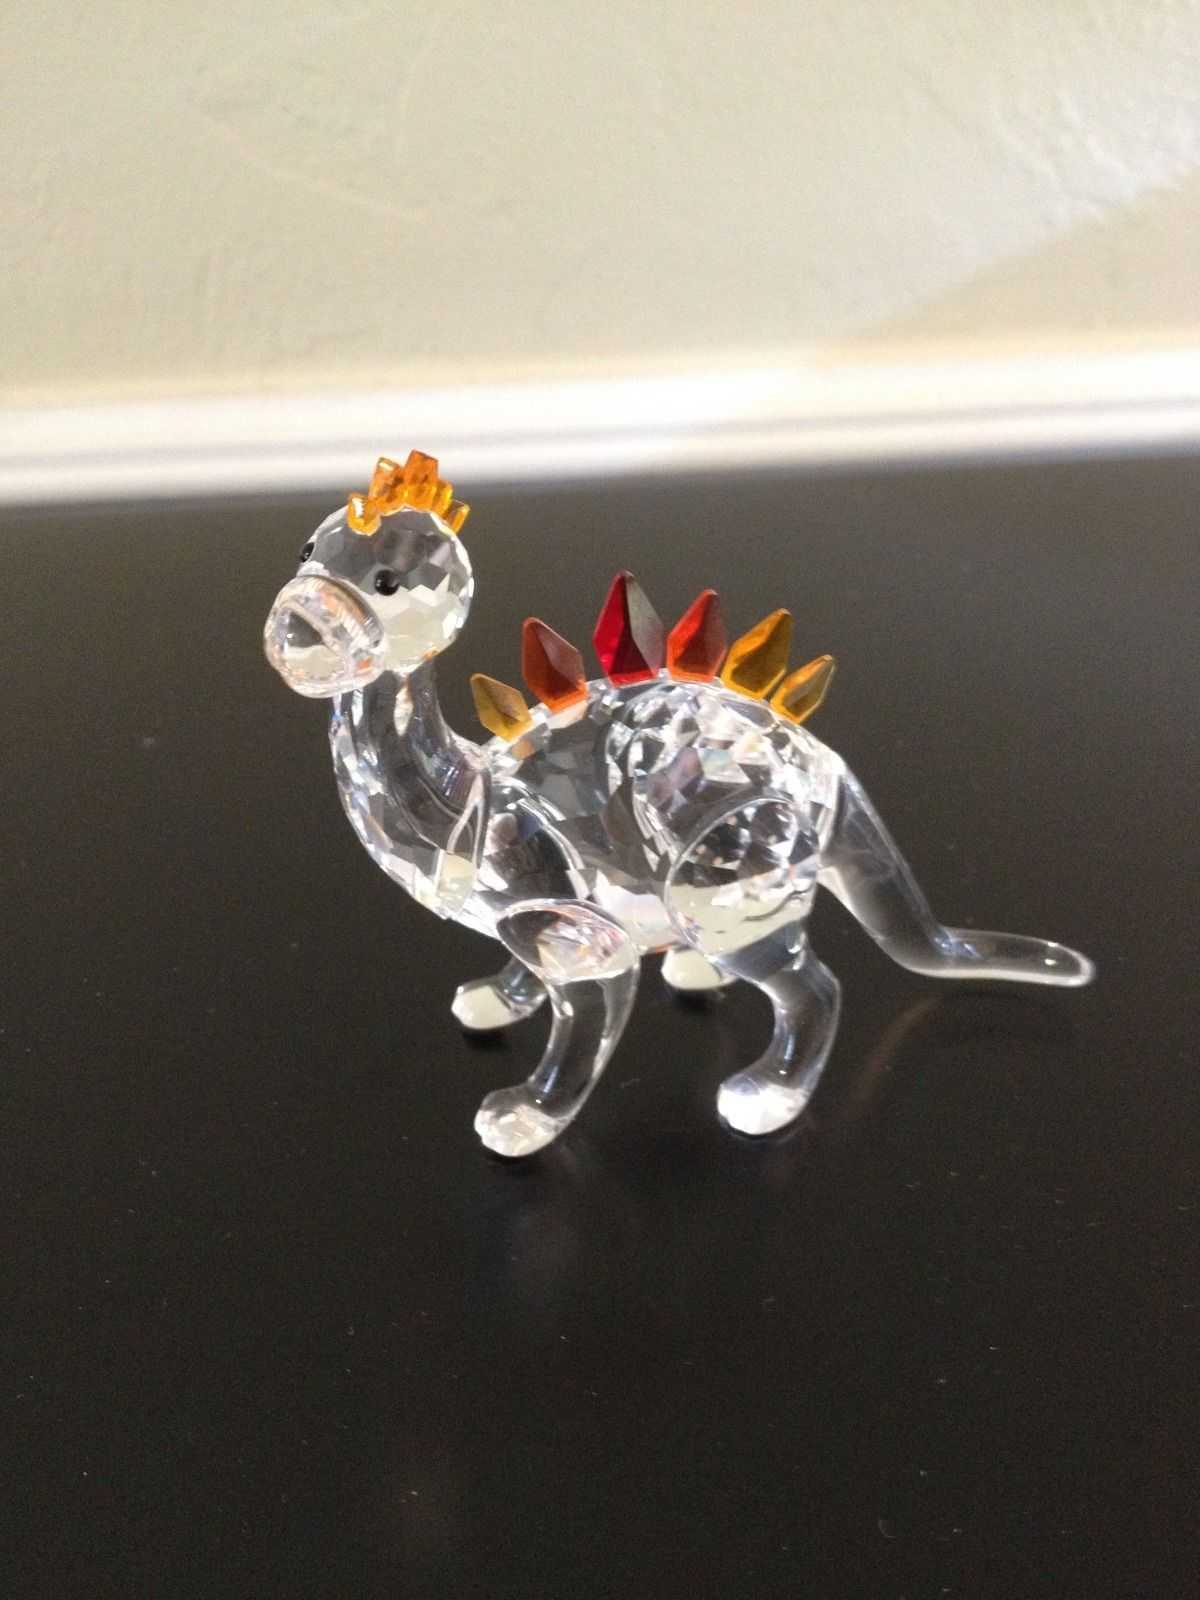 ba5bfff31b69 Swarovski Crystal Dino Dinosaur Figurine Retired 268204 Mint in Box with  Certificate